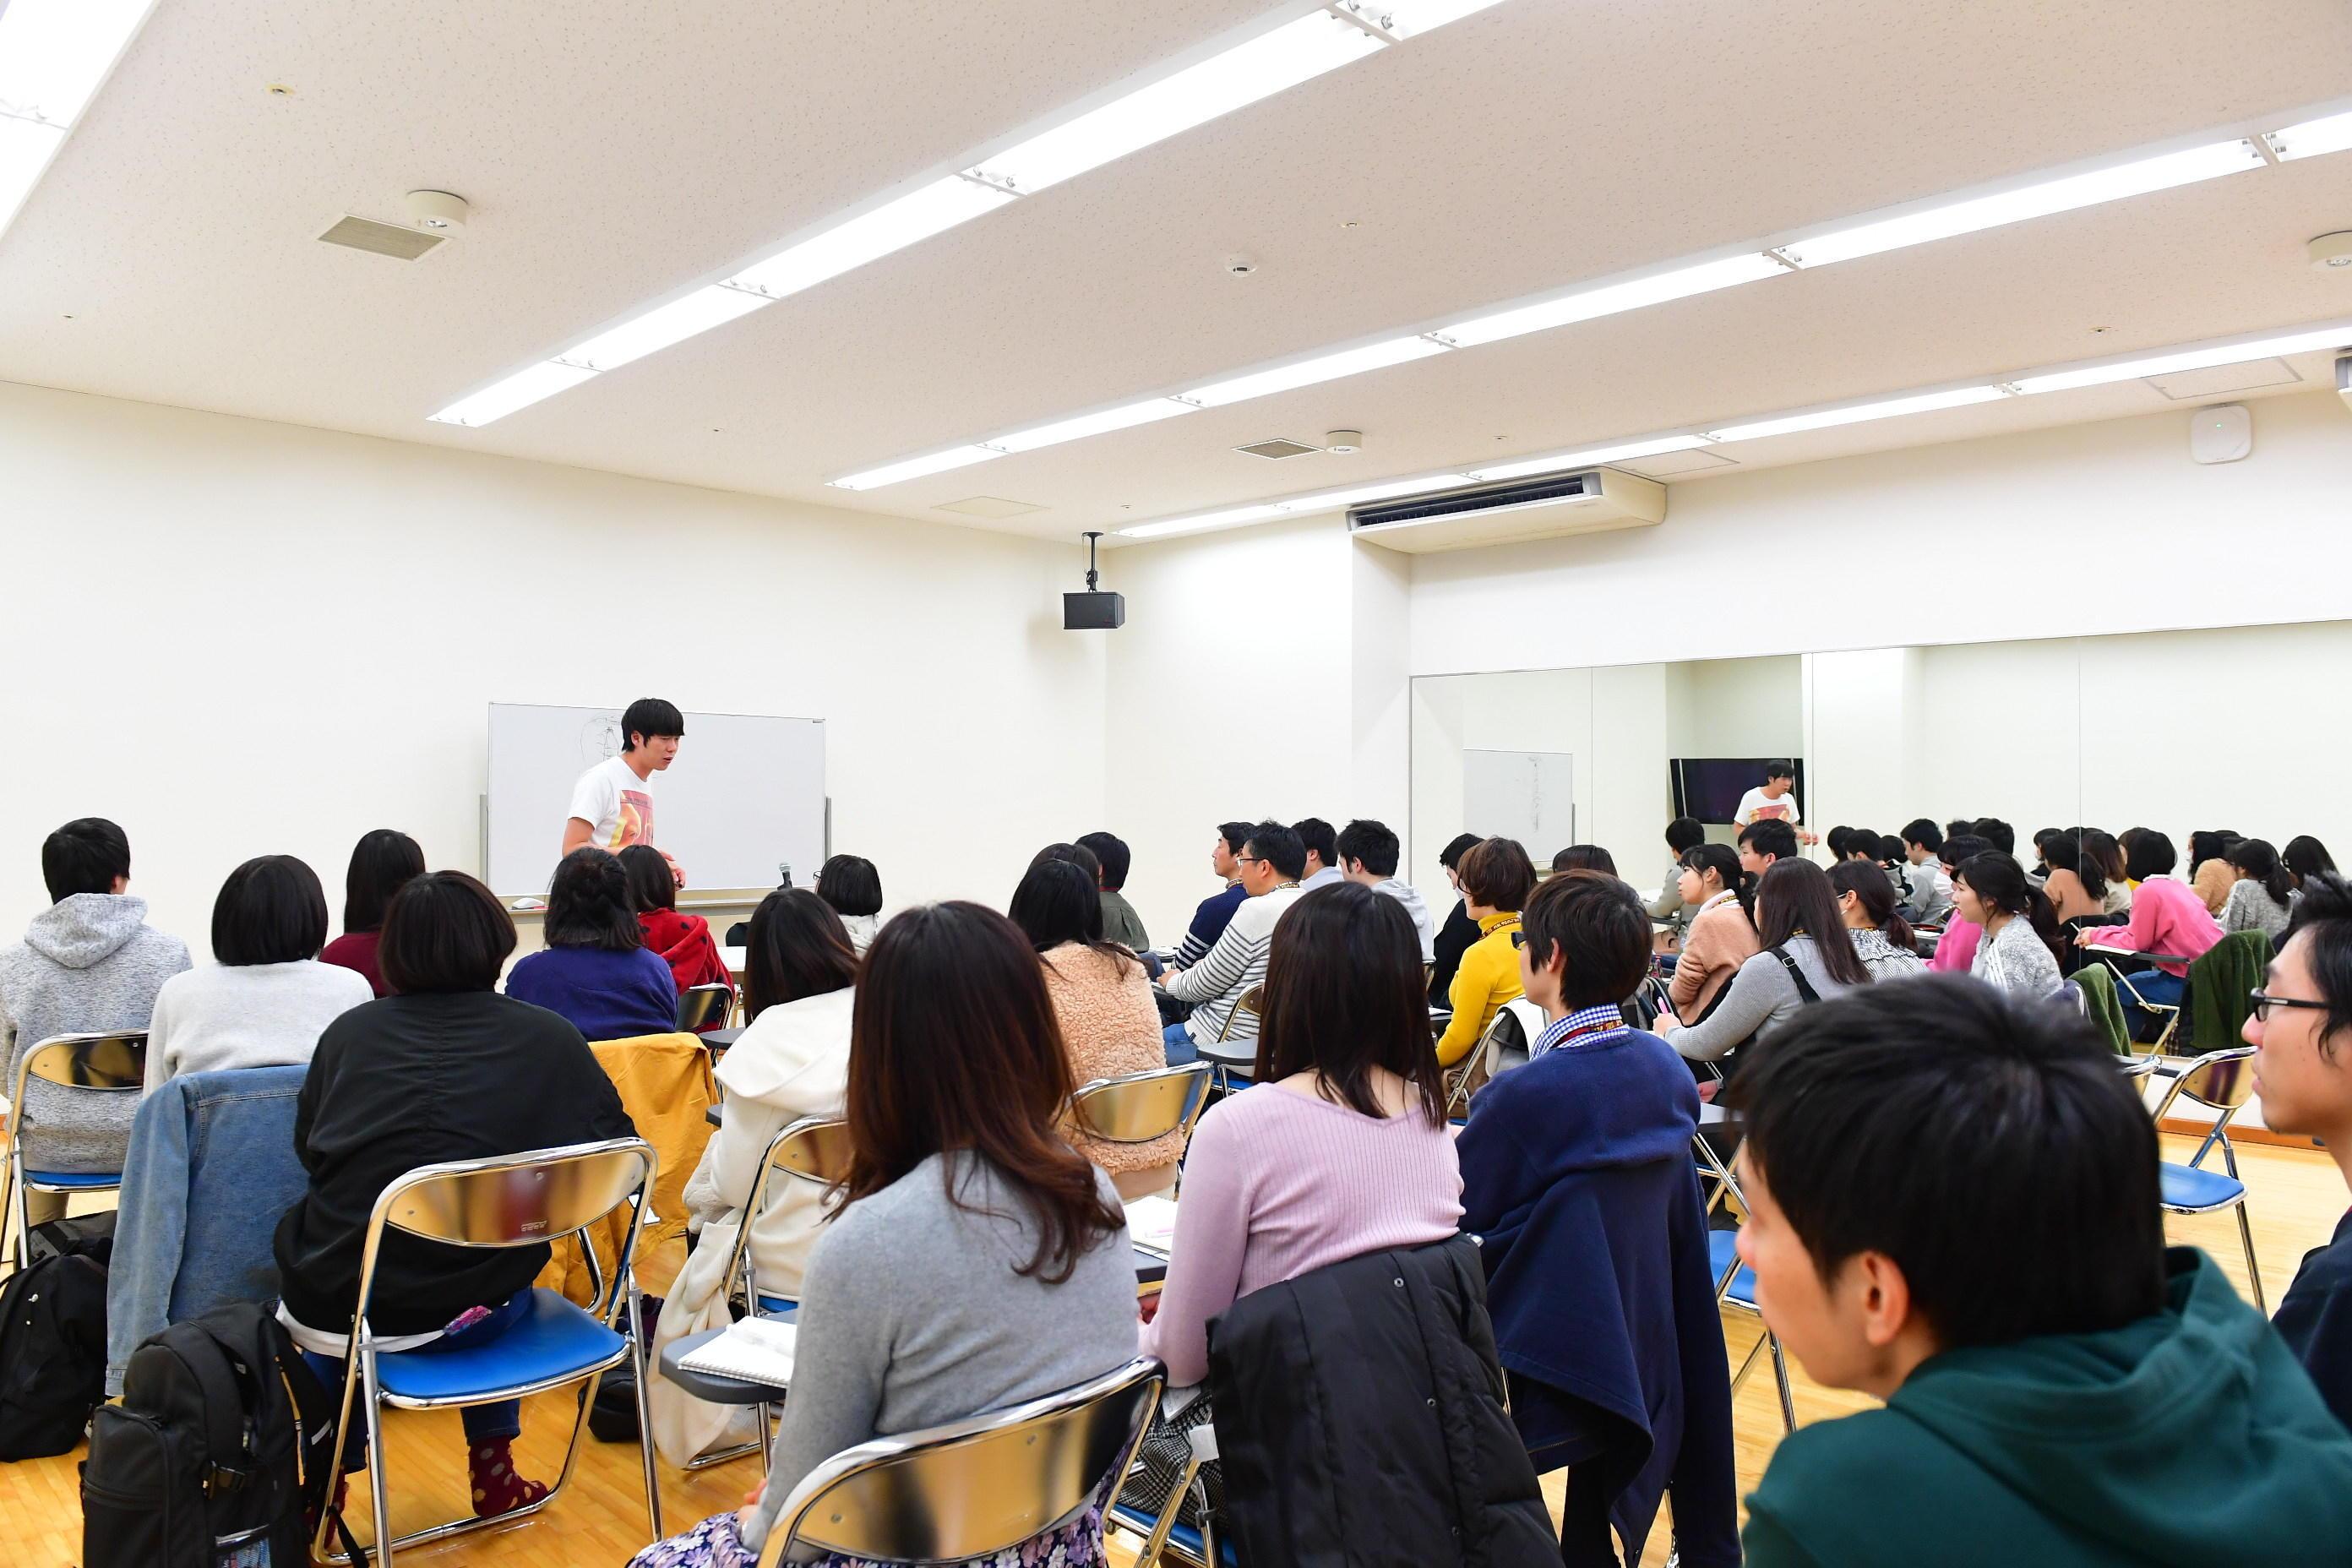 http://news.yoshimoto.co.jp/20180109173935-fce5979855093d4c835ffd794686fc5d1f6730d3.jpg